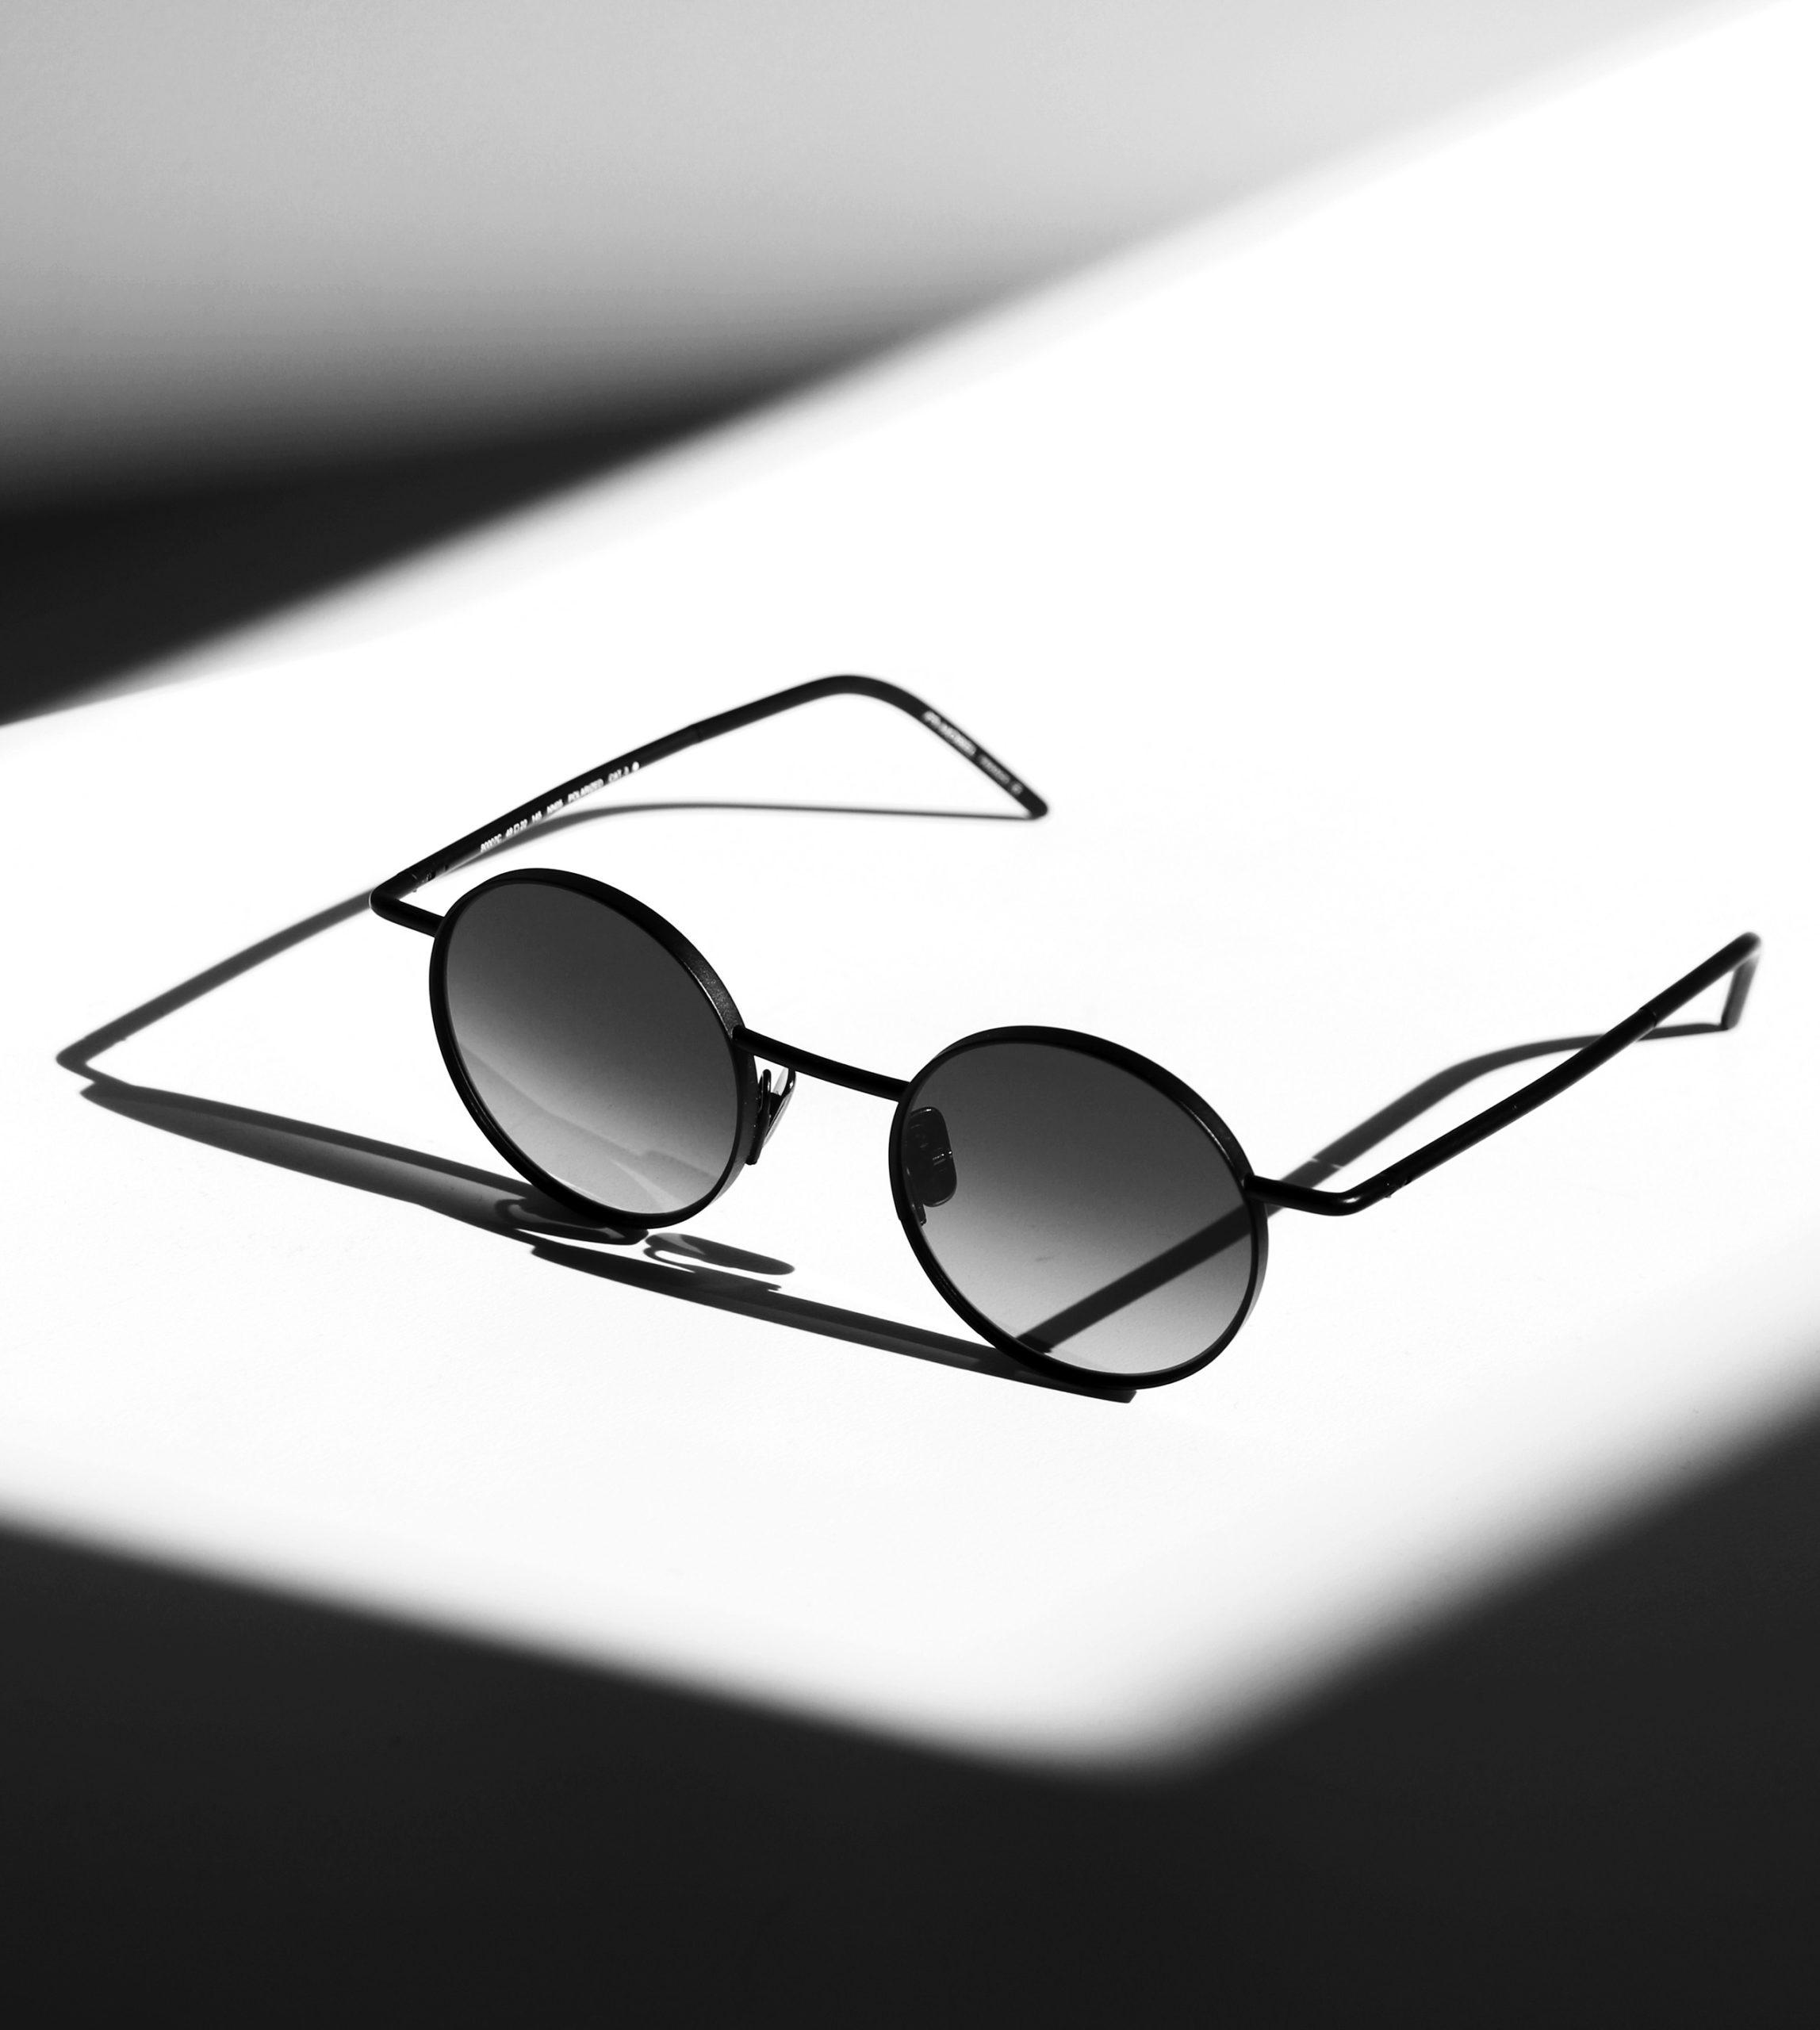 Morel Titanium, Jean Nouvel Design © Morel